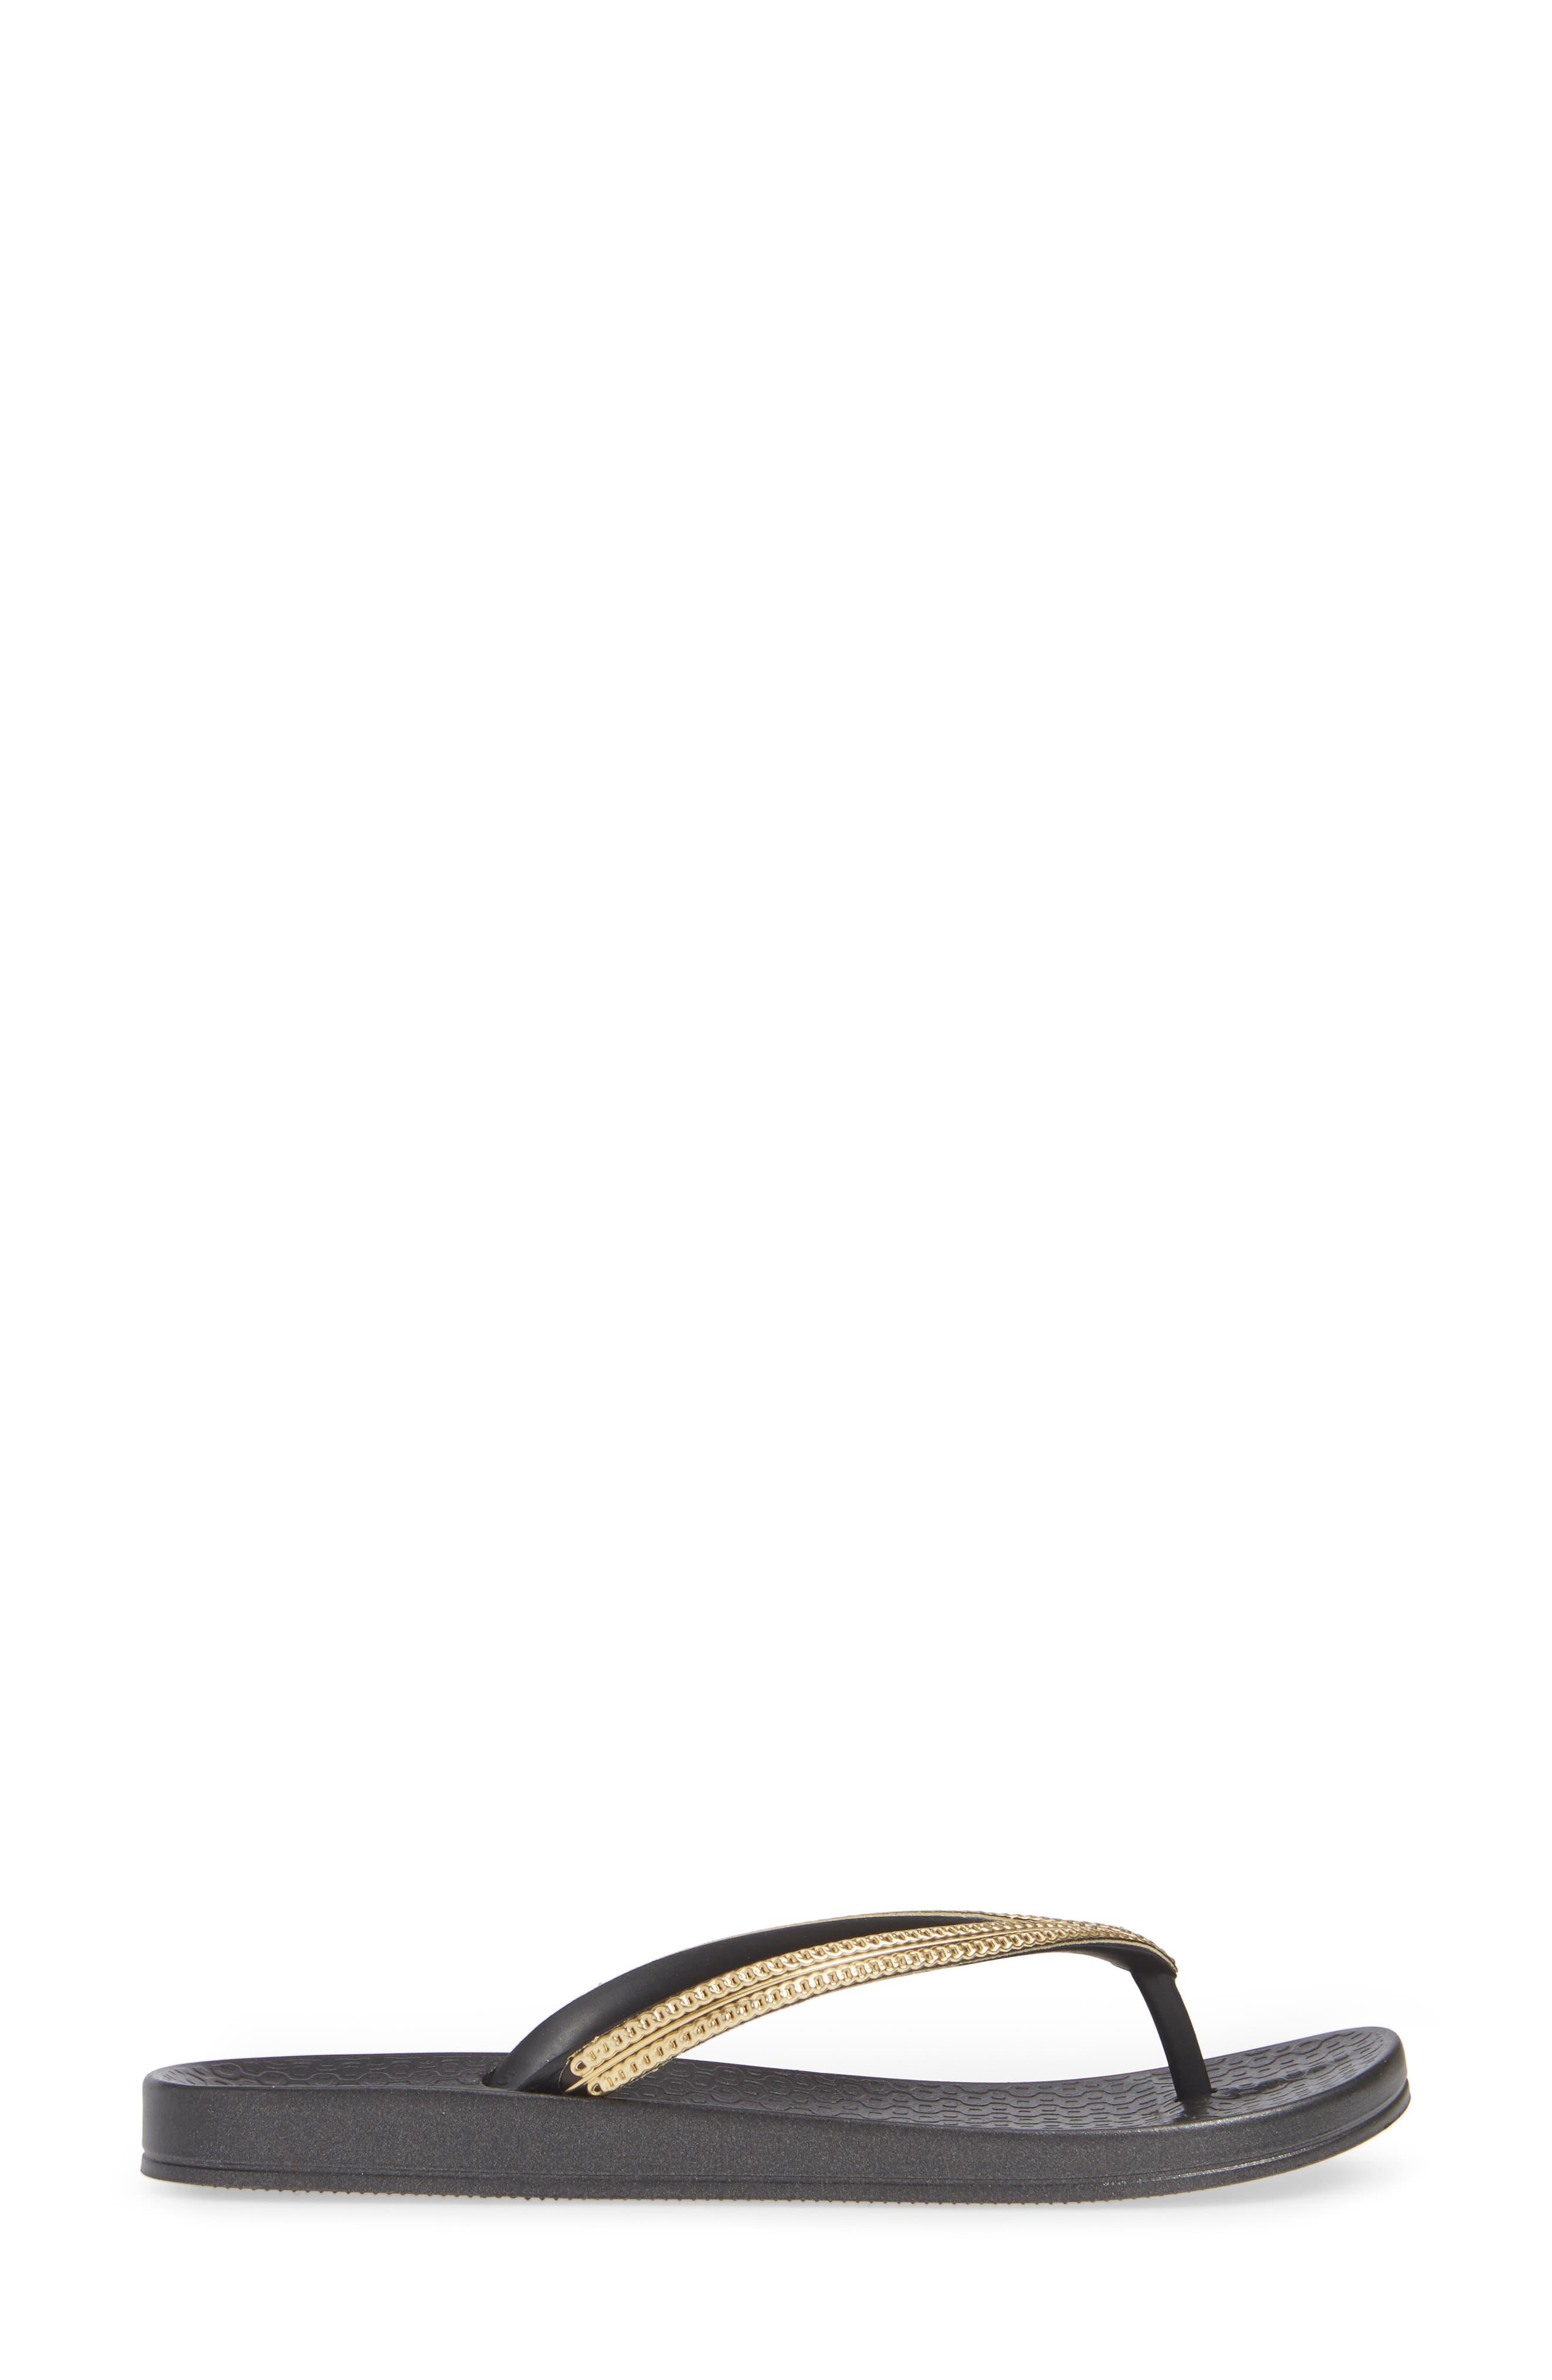 IPANEMA, Ana Metallic Flip Flop, Alternate thumbnail 3, color, BLACK/ GOLD